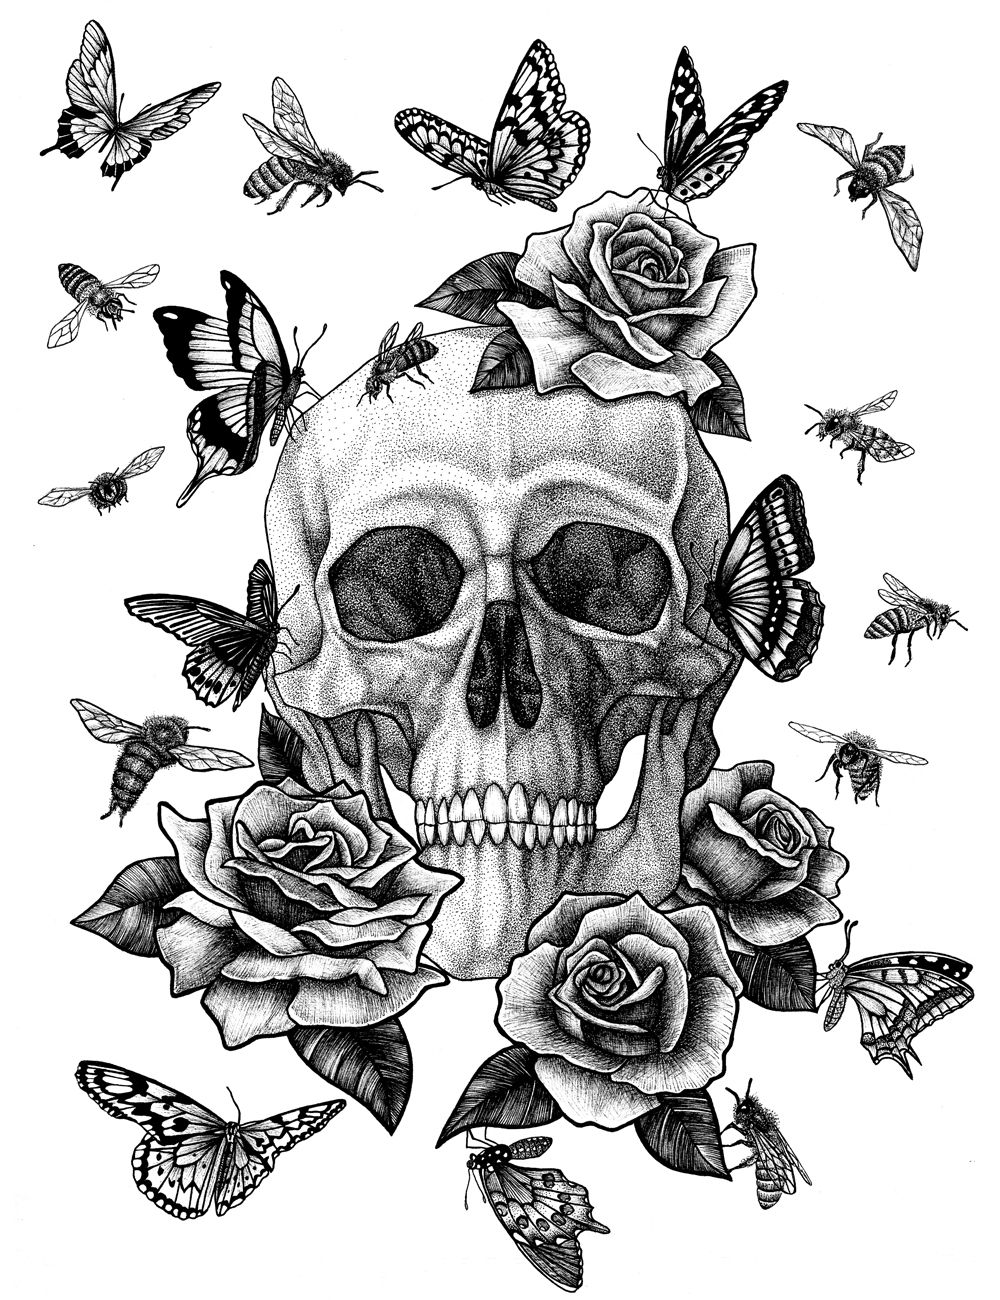 Vanité n°23 - Marianne Blanchard  Tatouage homme, Illustration et